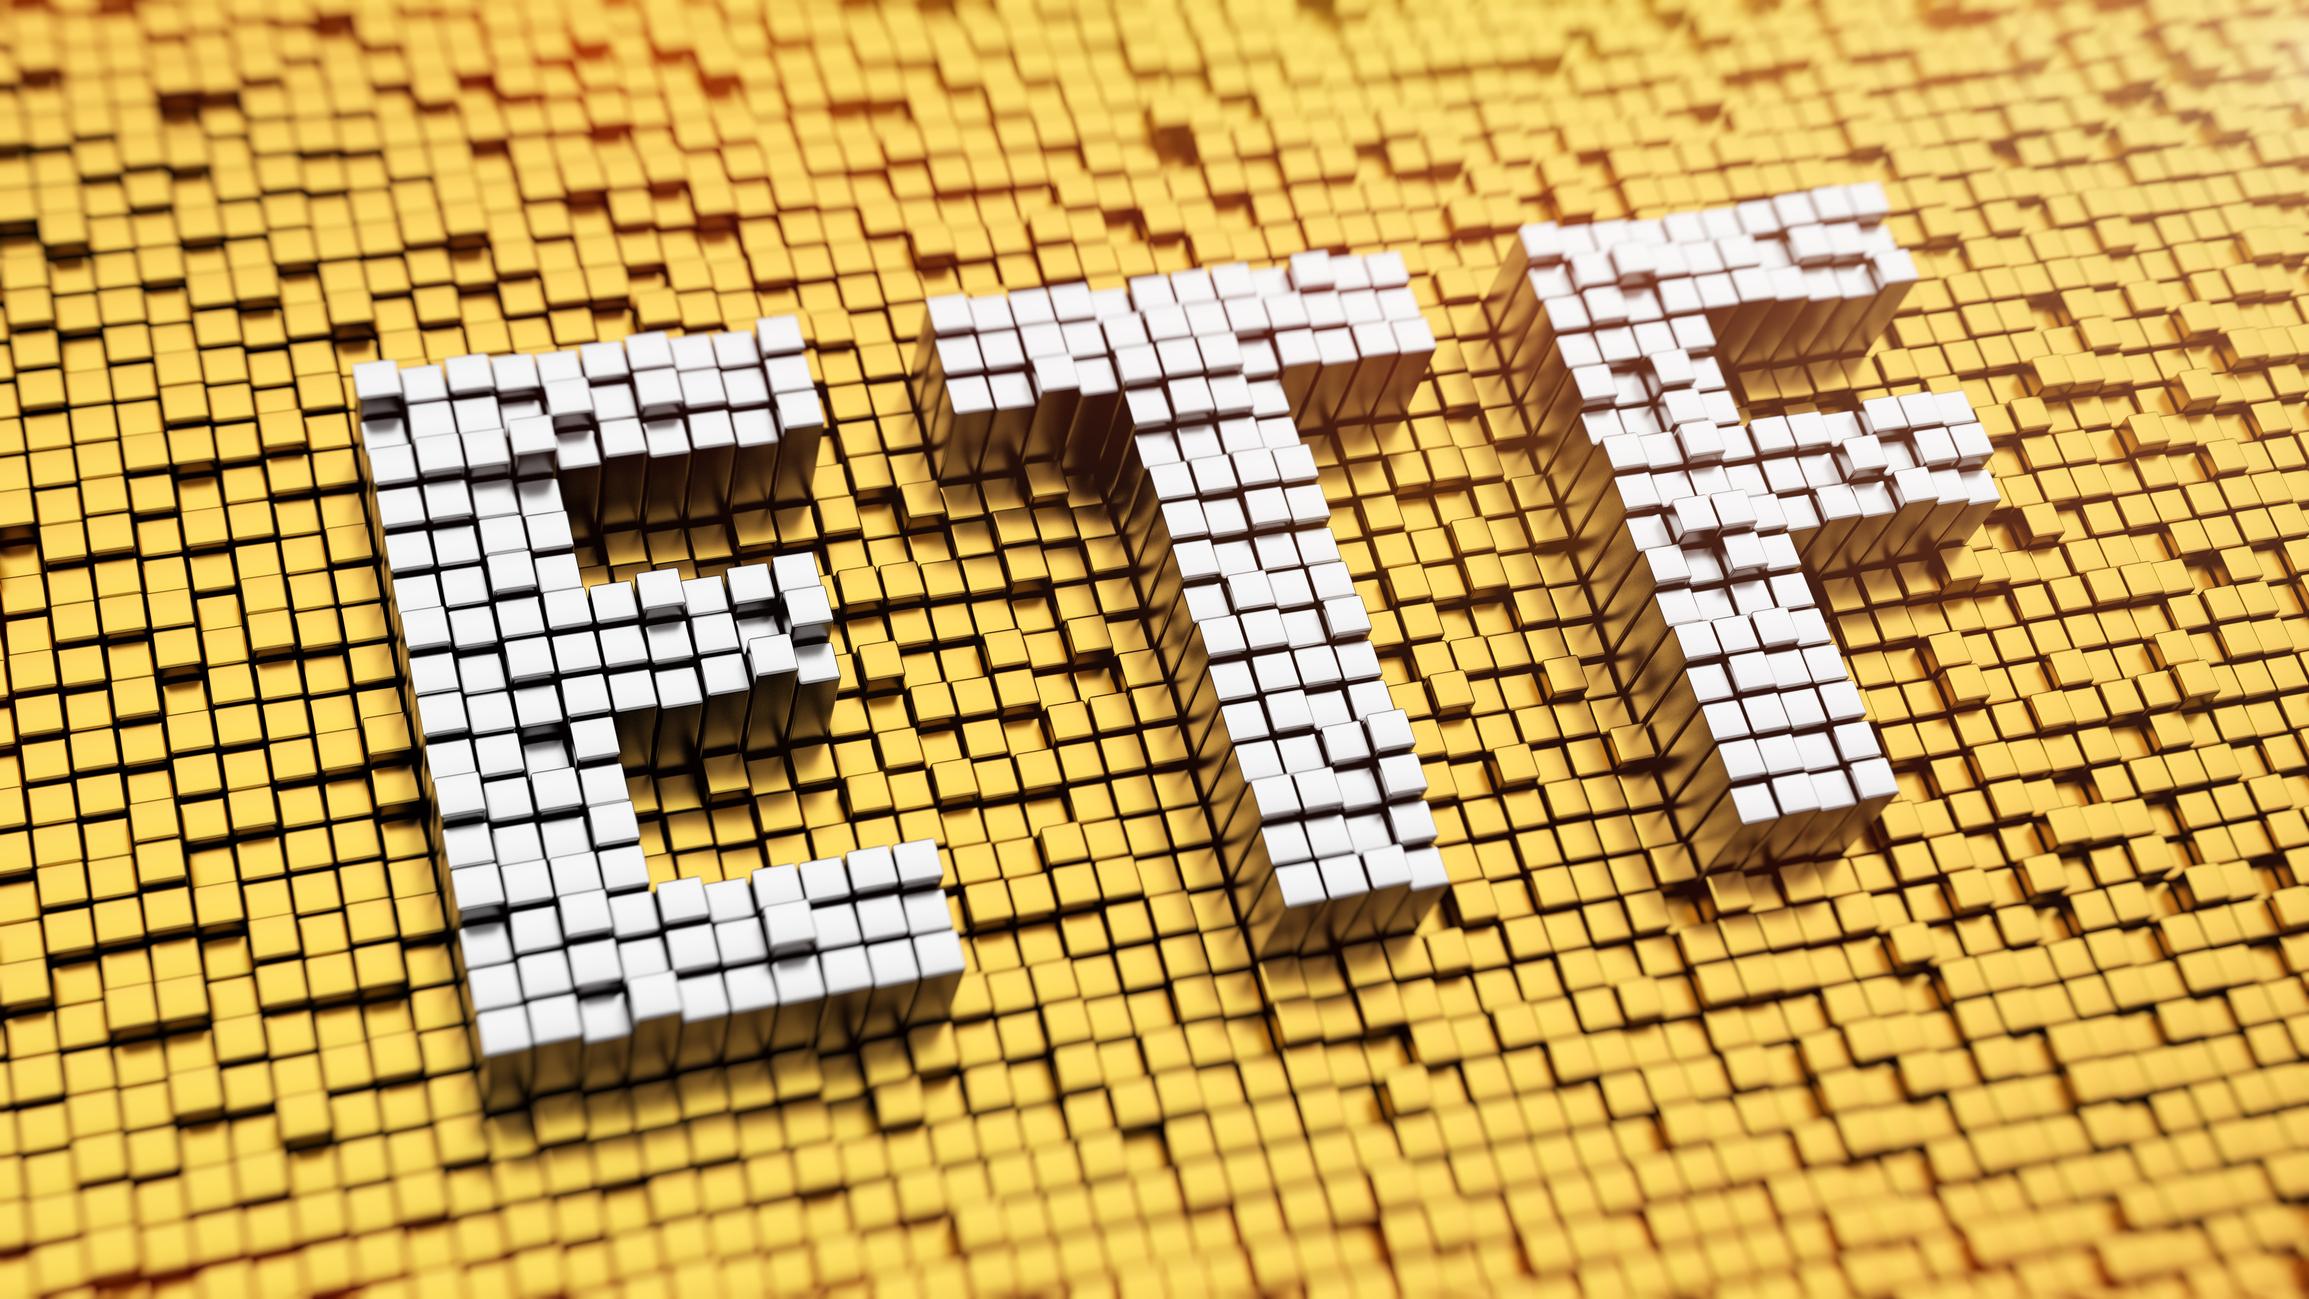 White mosaic blocks spelling ETF against gold mosaic blocks in background.